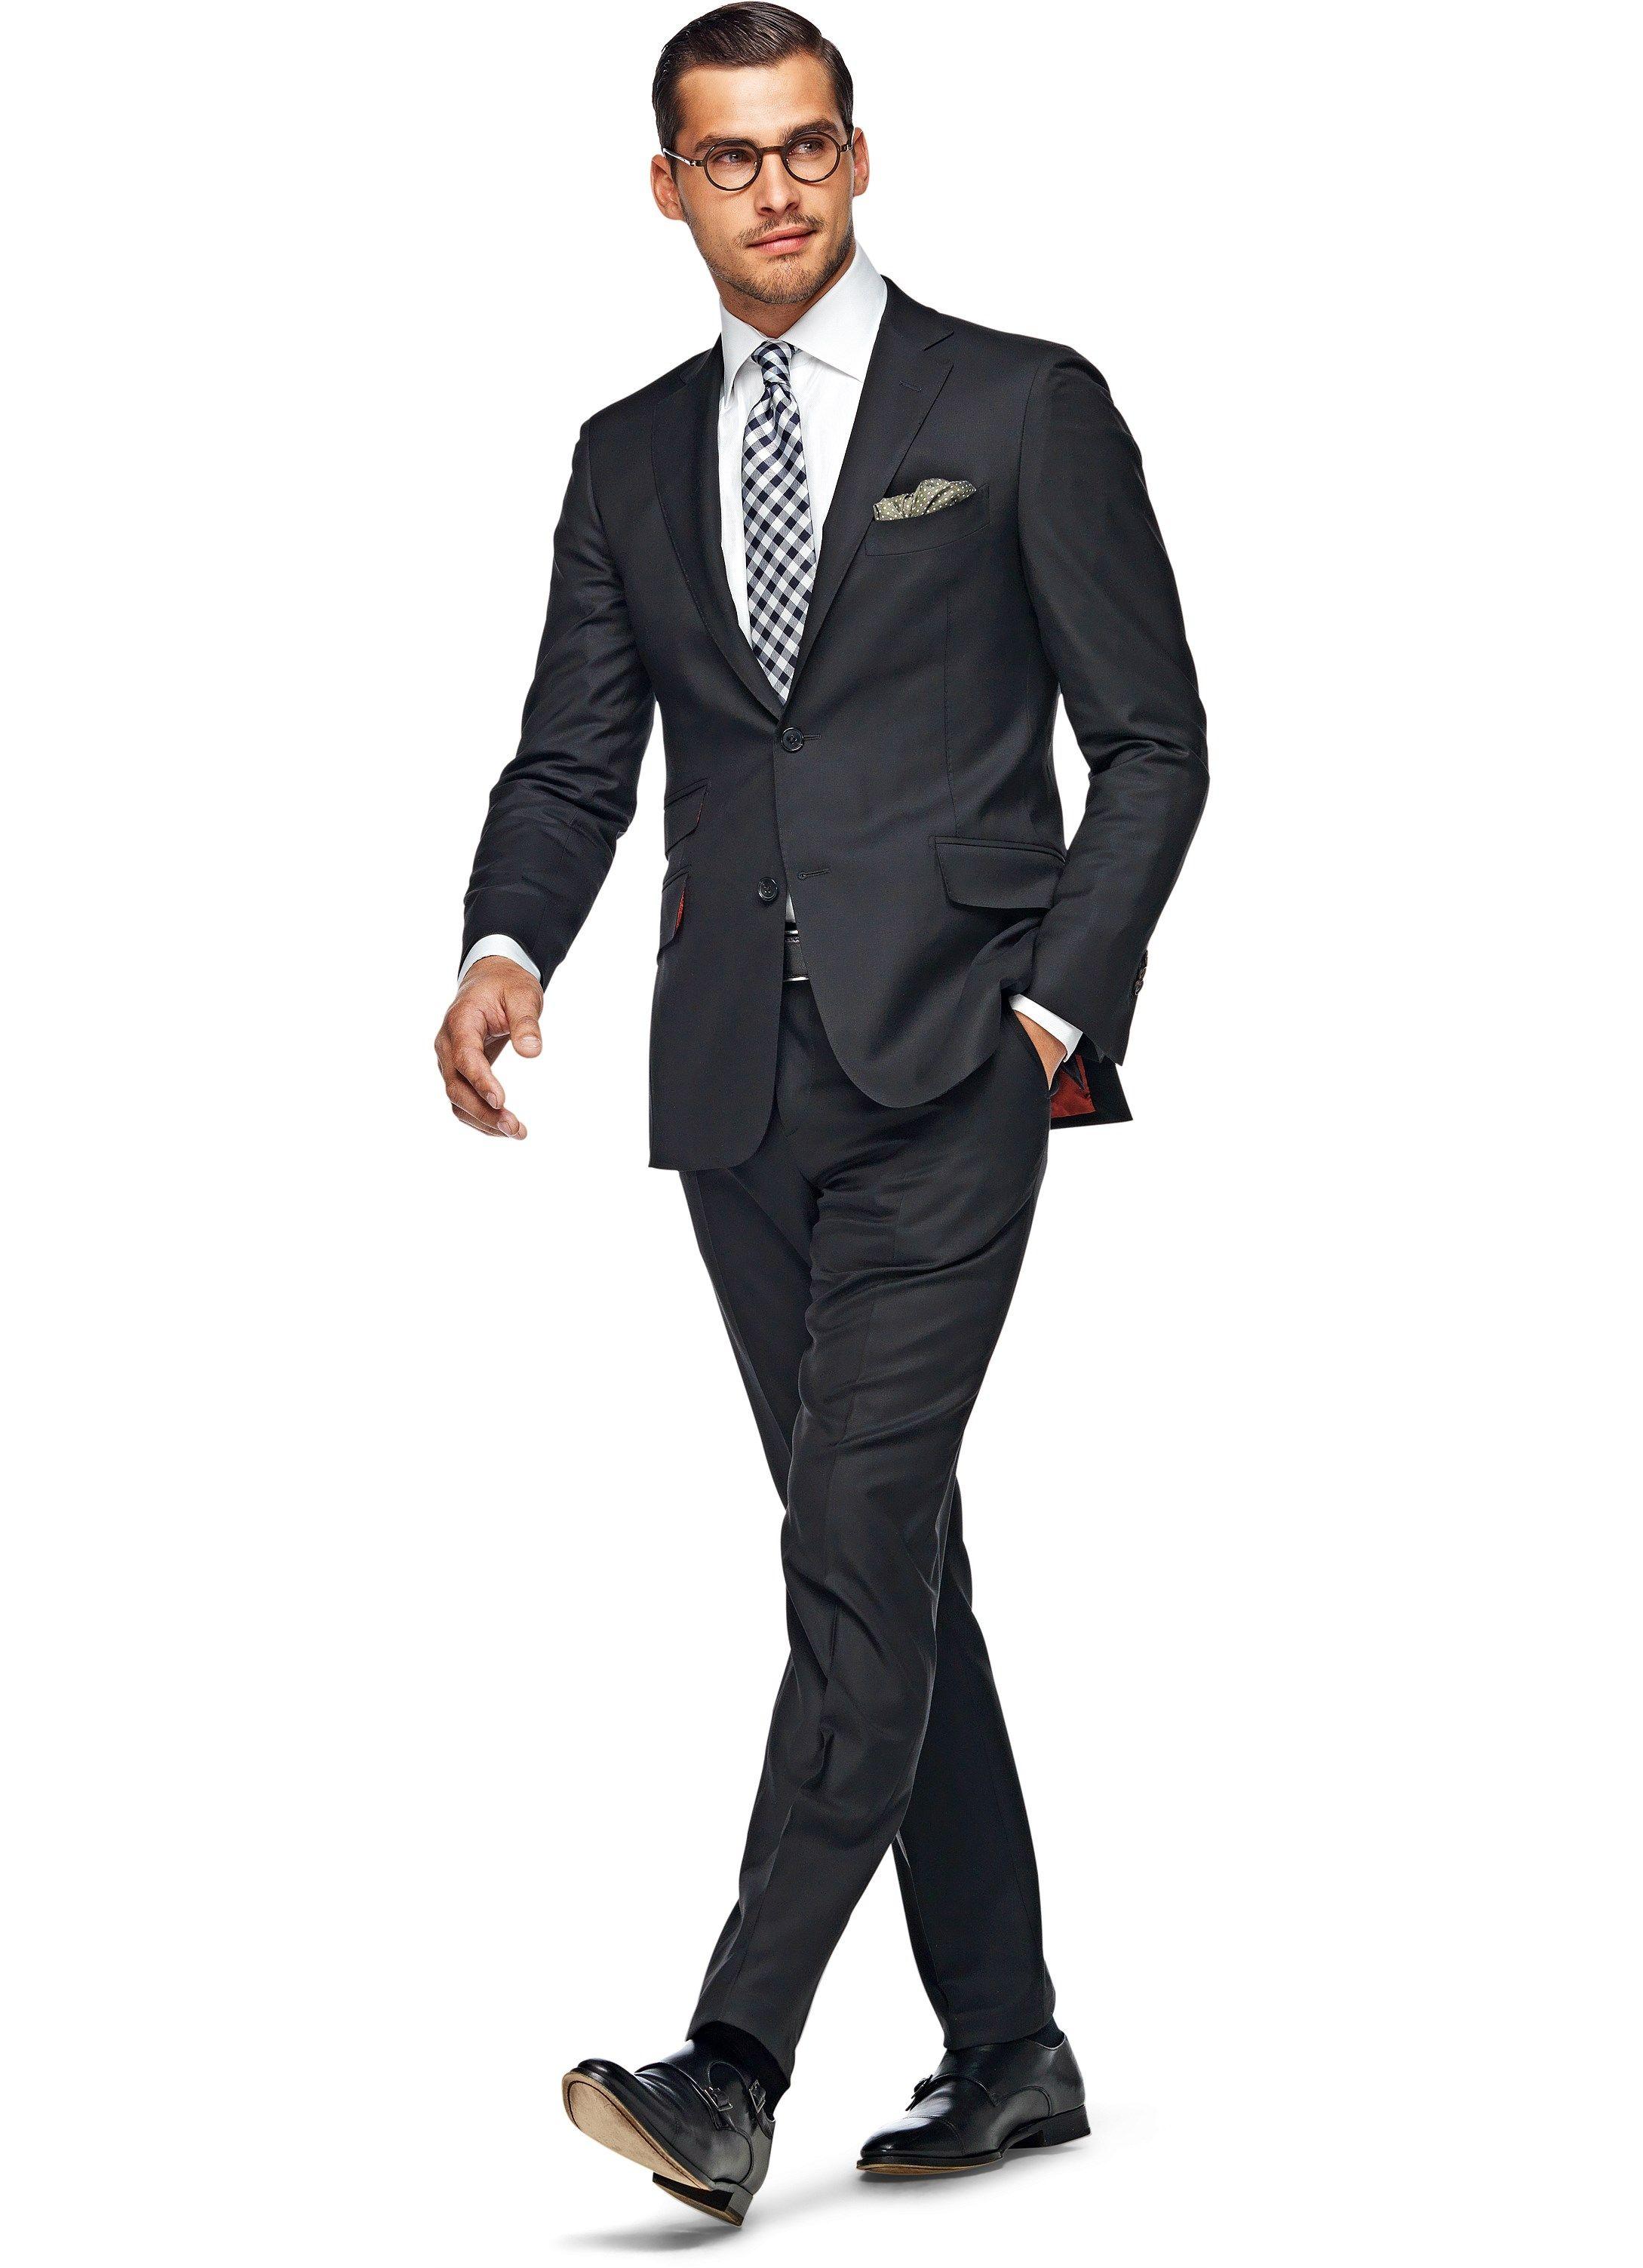 Suit Black Plain Sienna P3599i | Suitsupply Online Store | Suiting ...